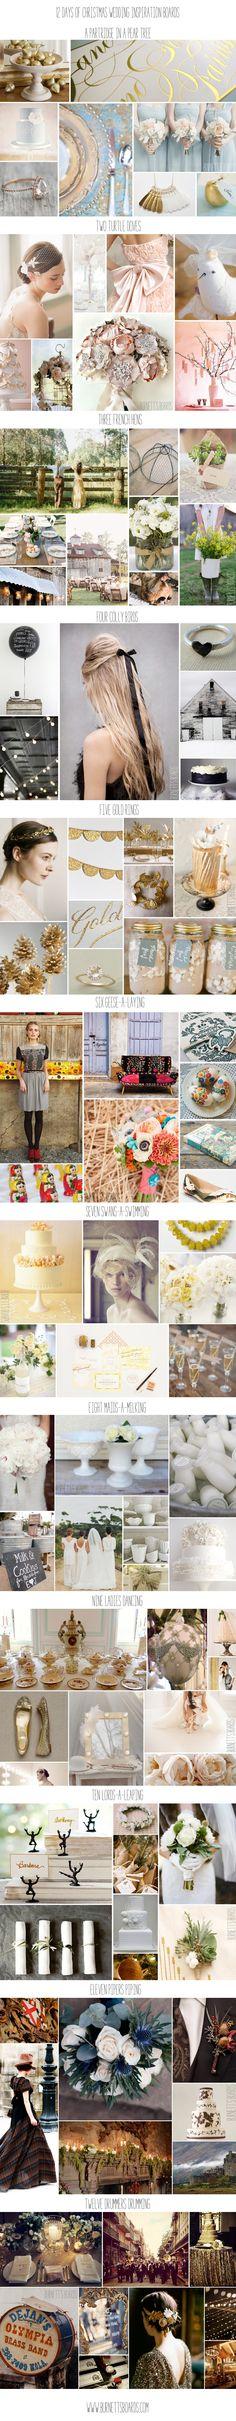 12 Days of Christmas wedding inspiration boards